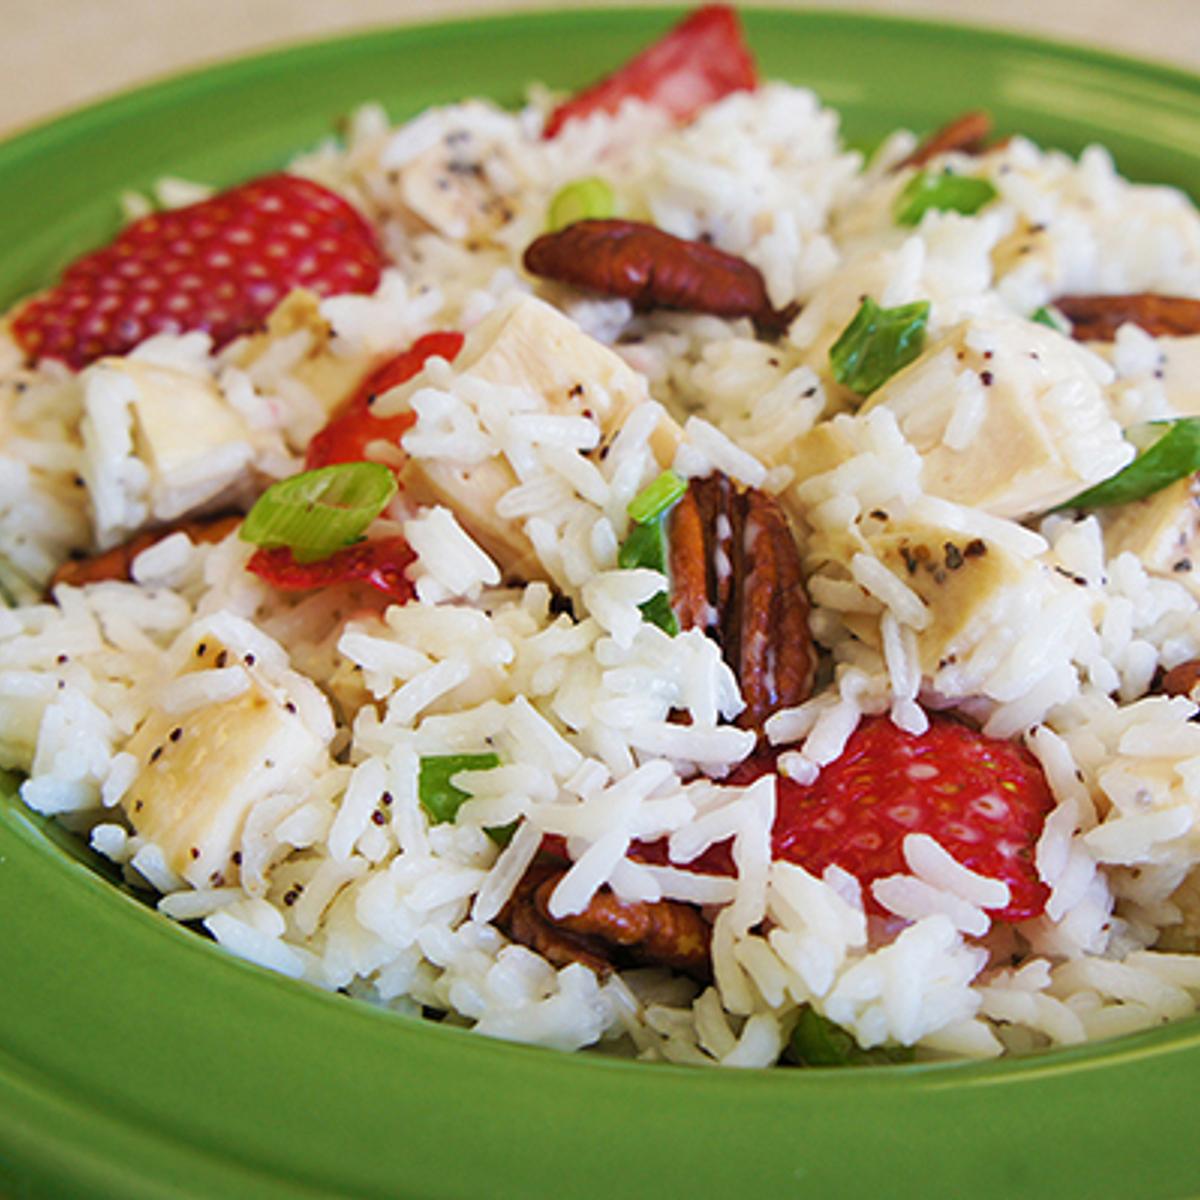 Poppy Seed Chicken & Rice Salad Recipe